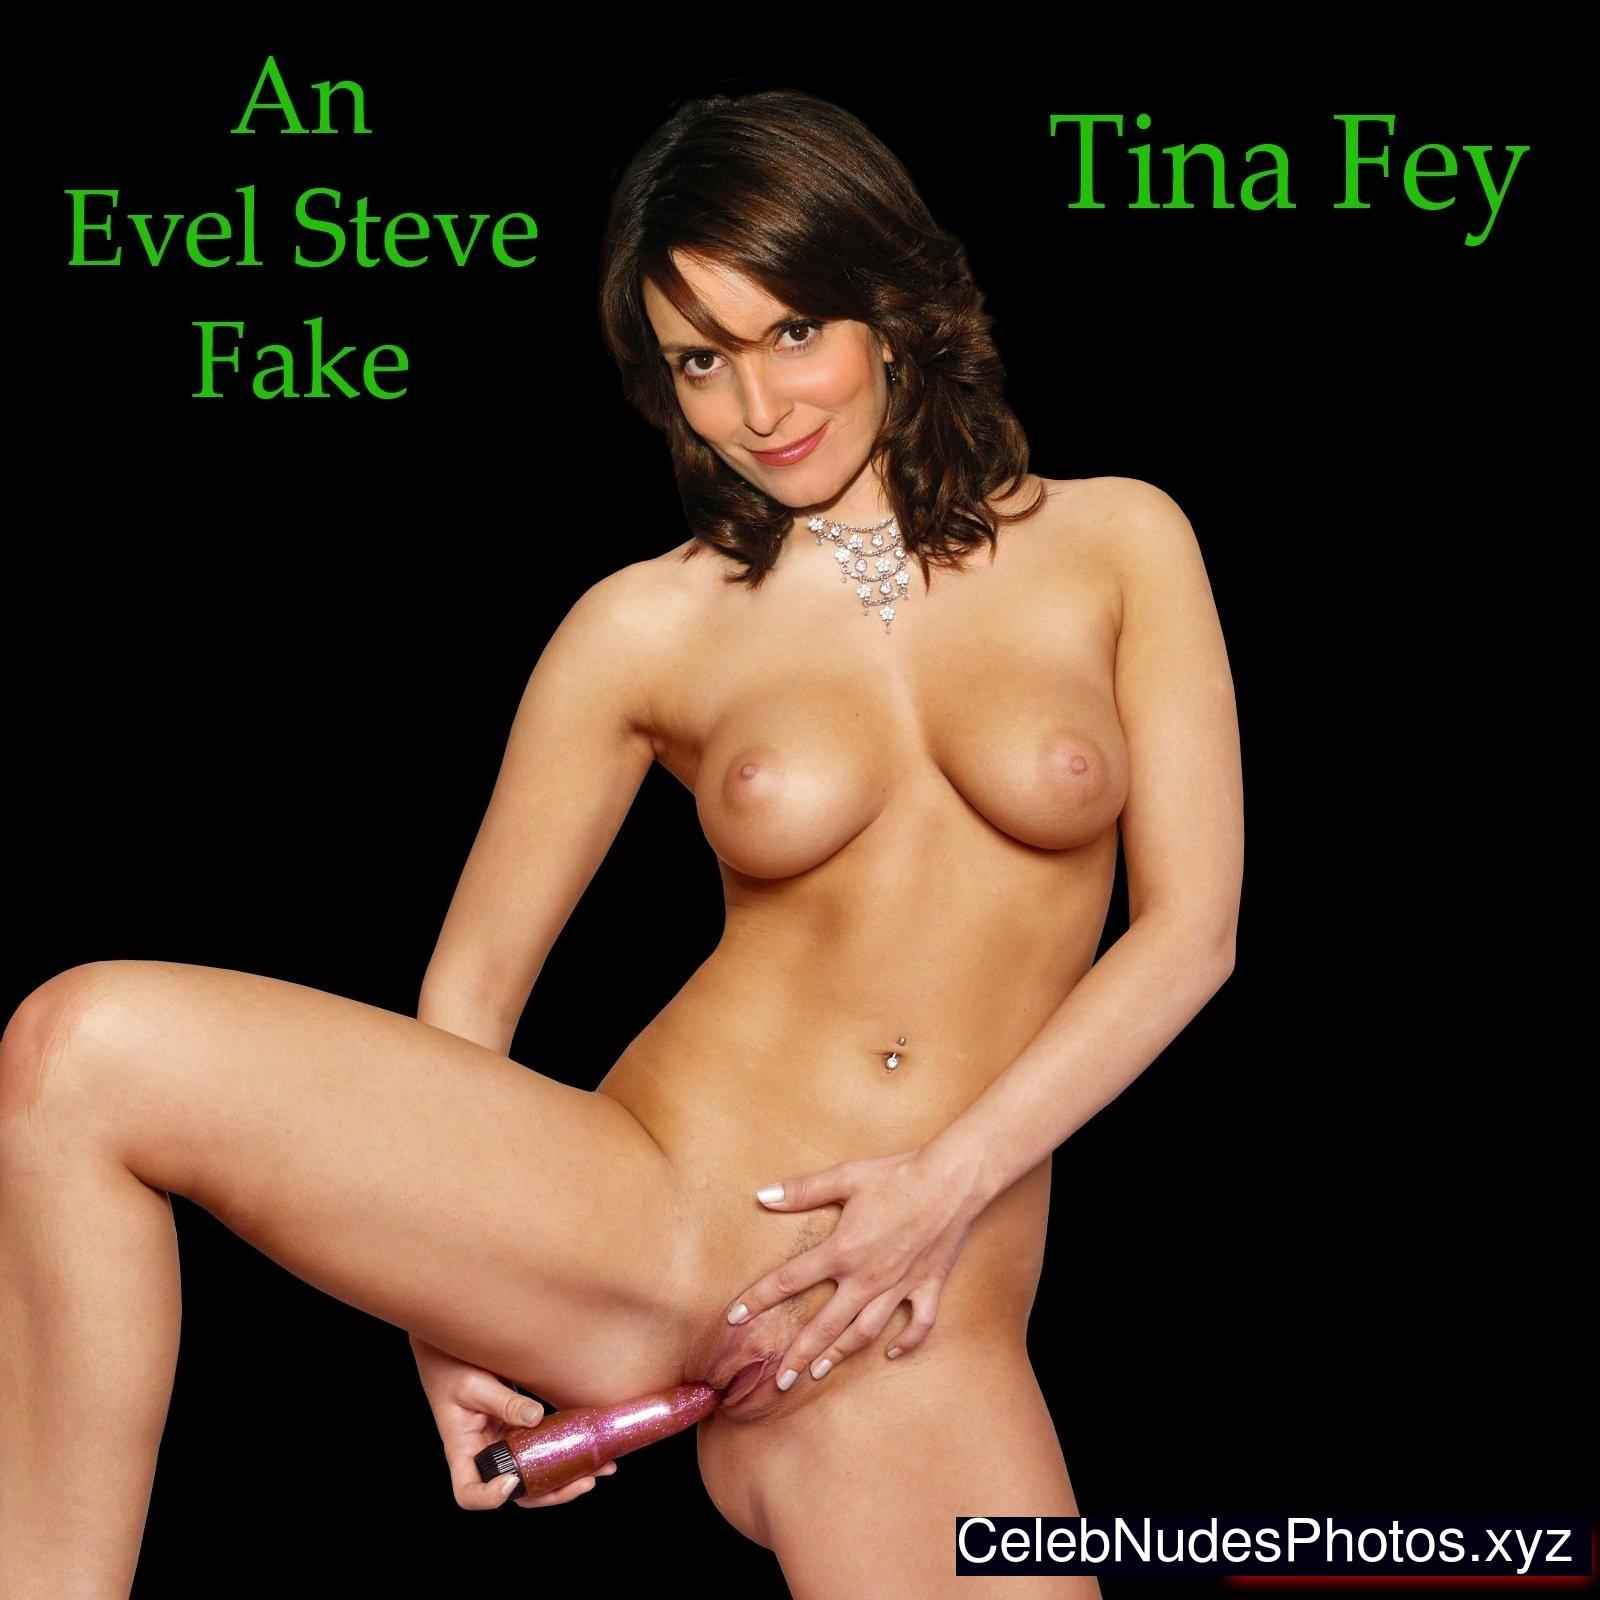 Tina fey fay nudes